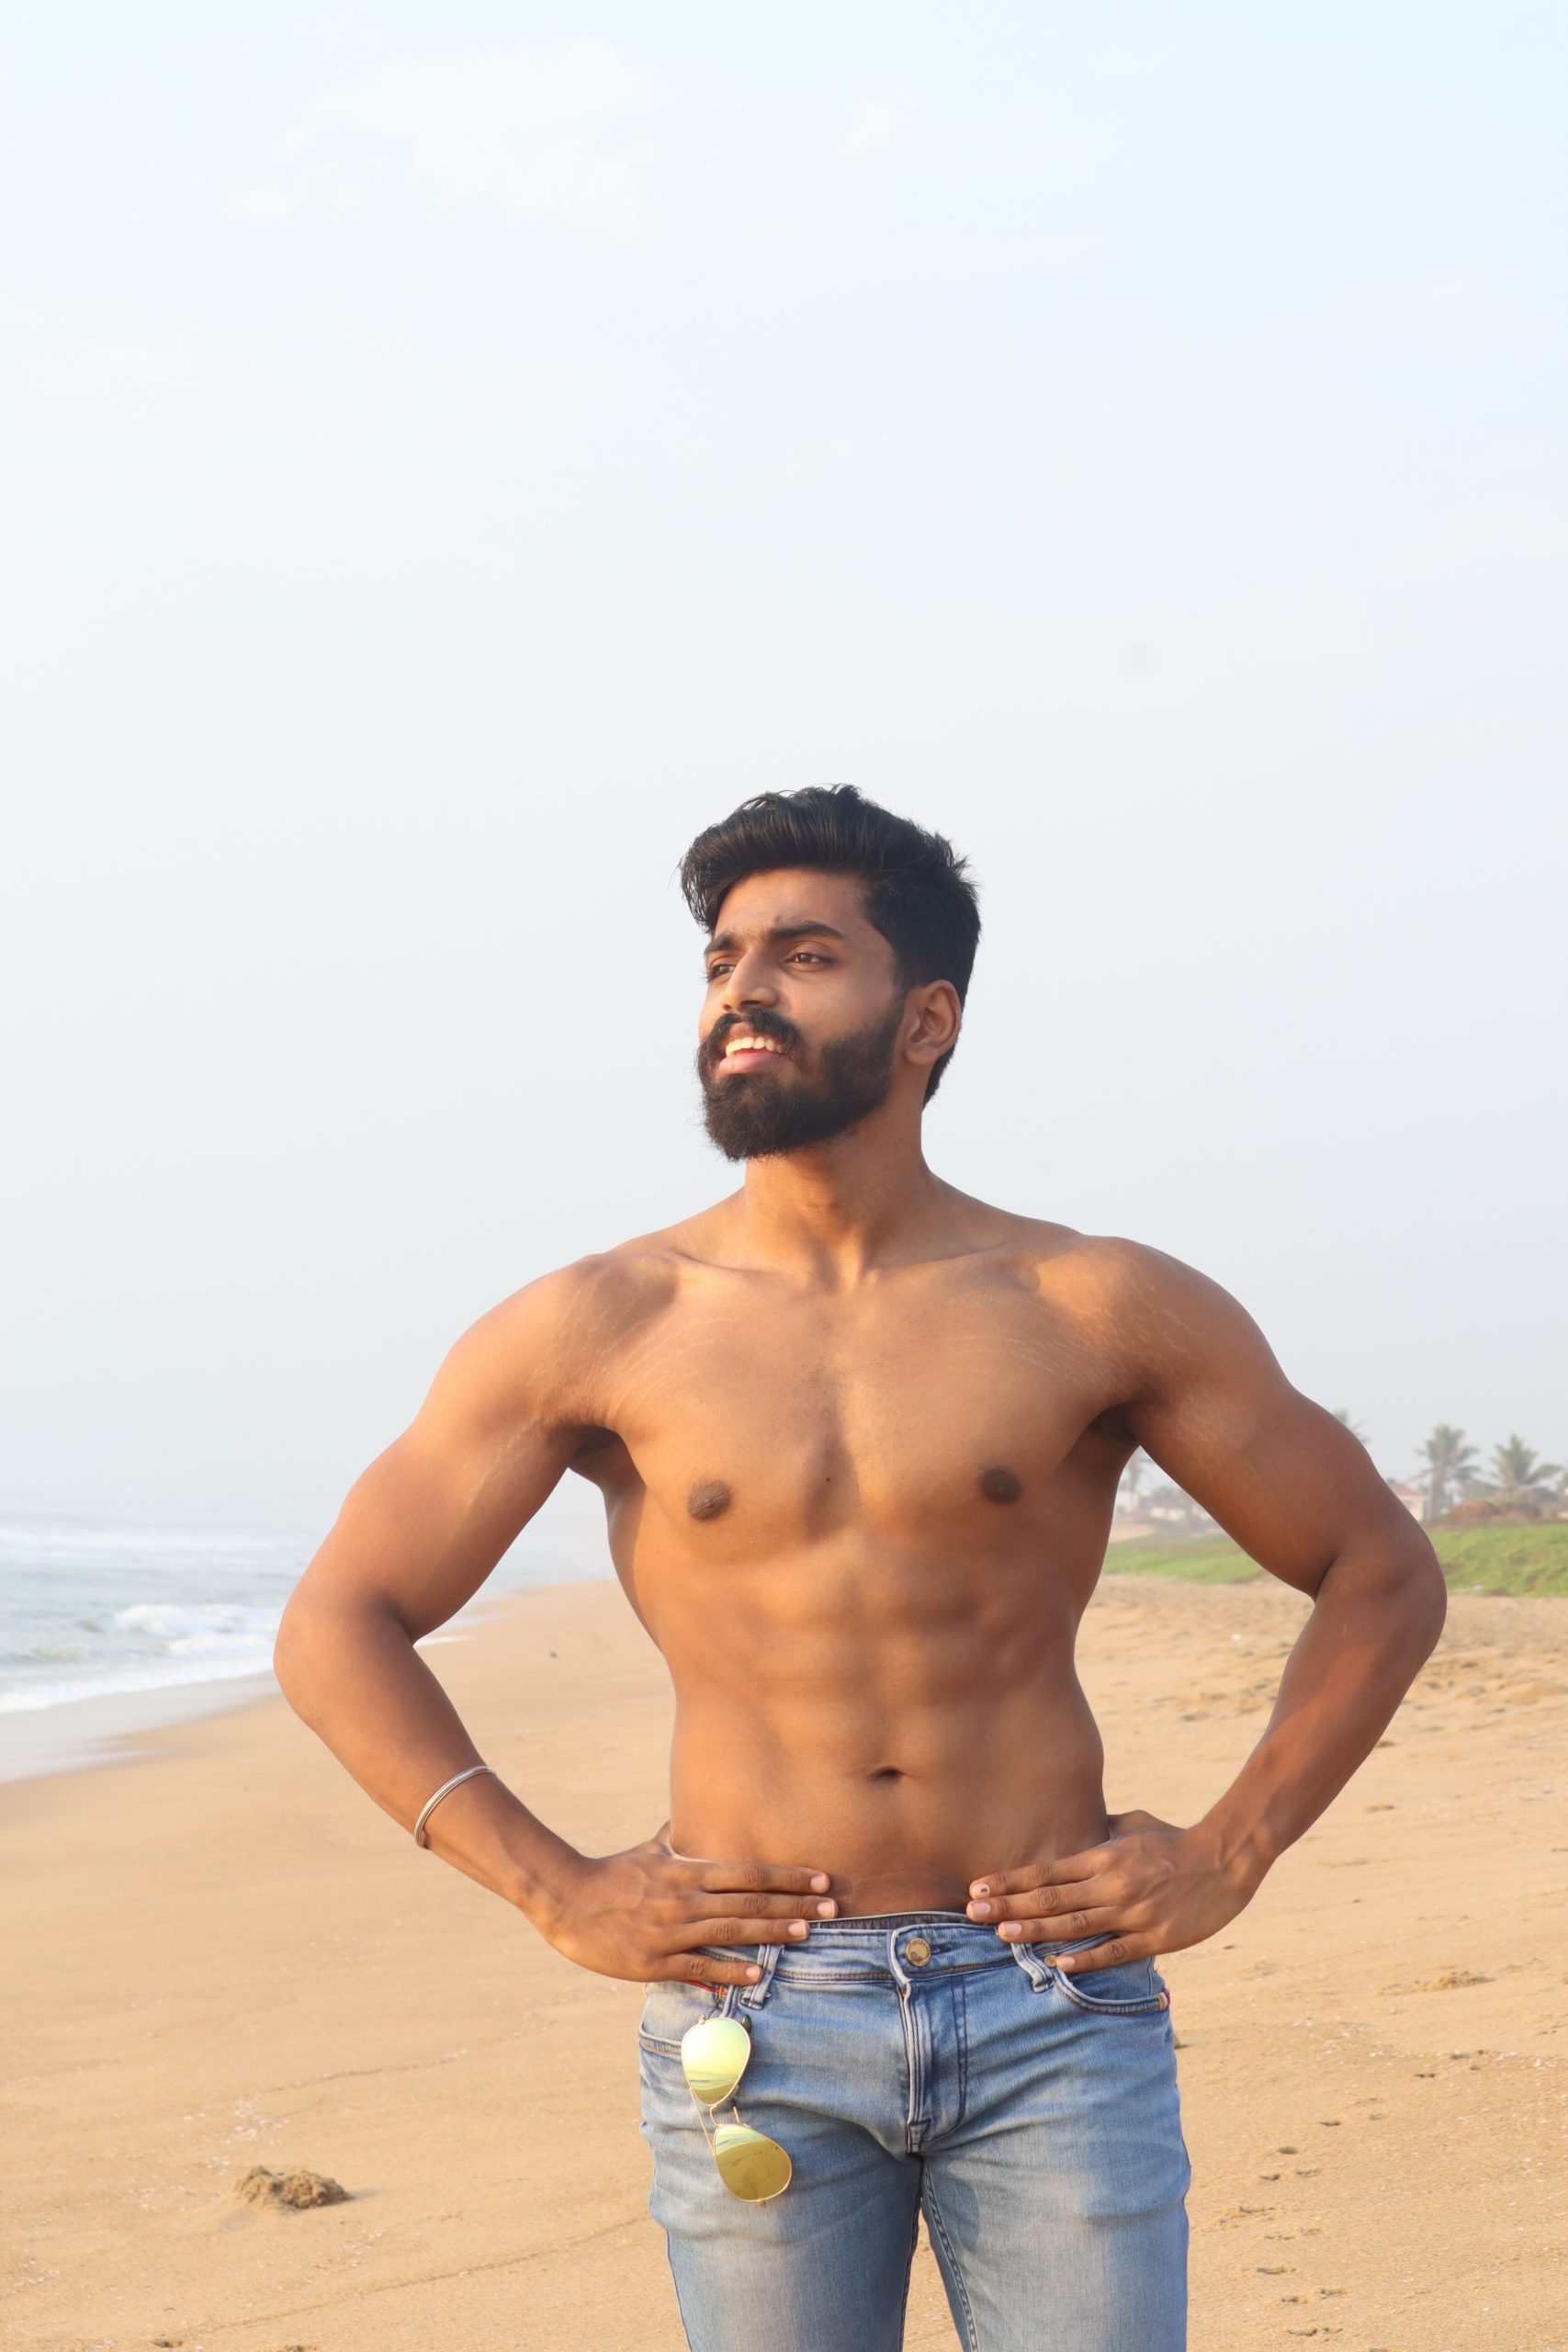 Fitness model posing on beach